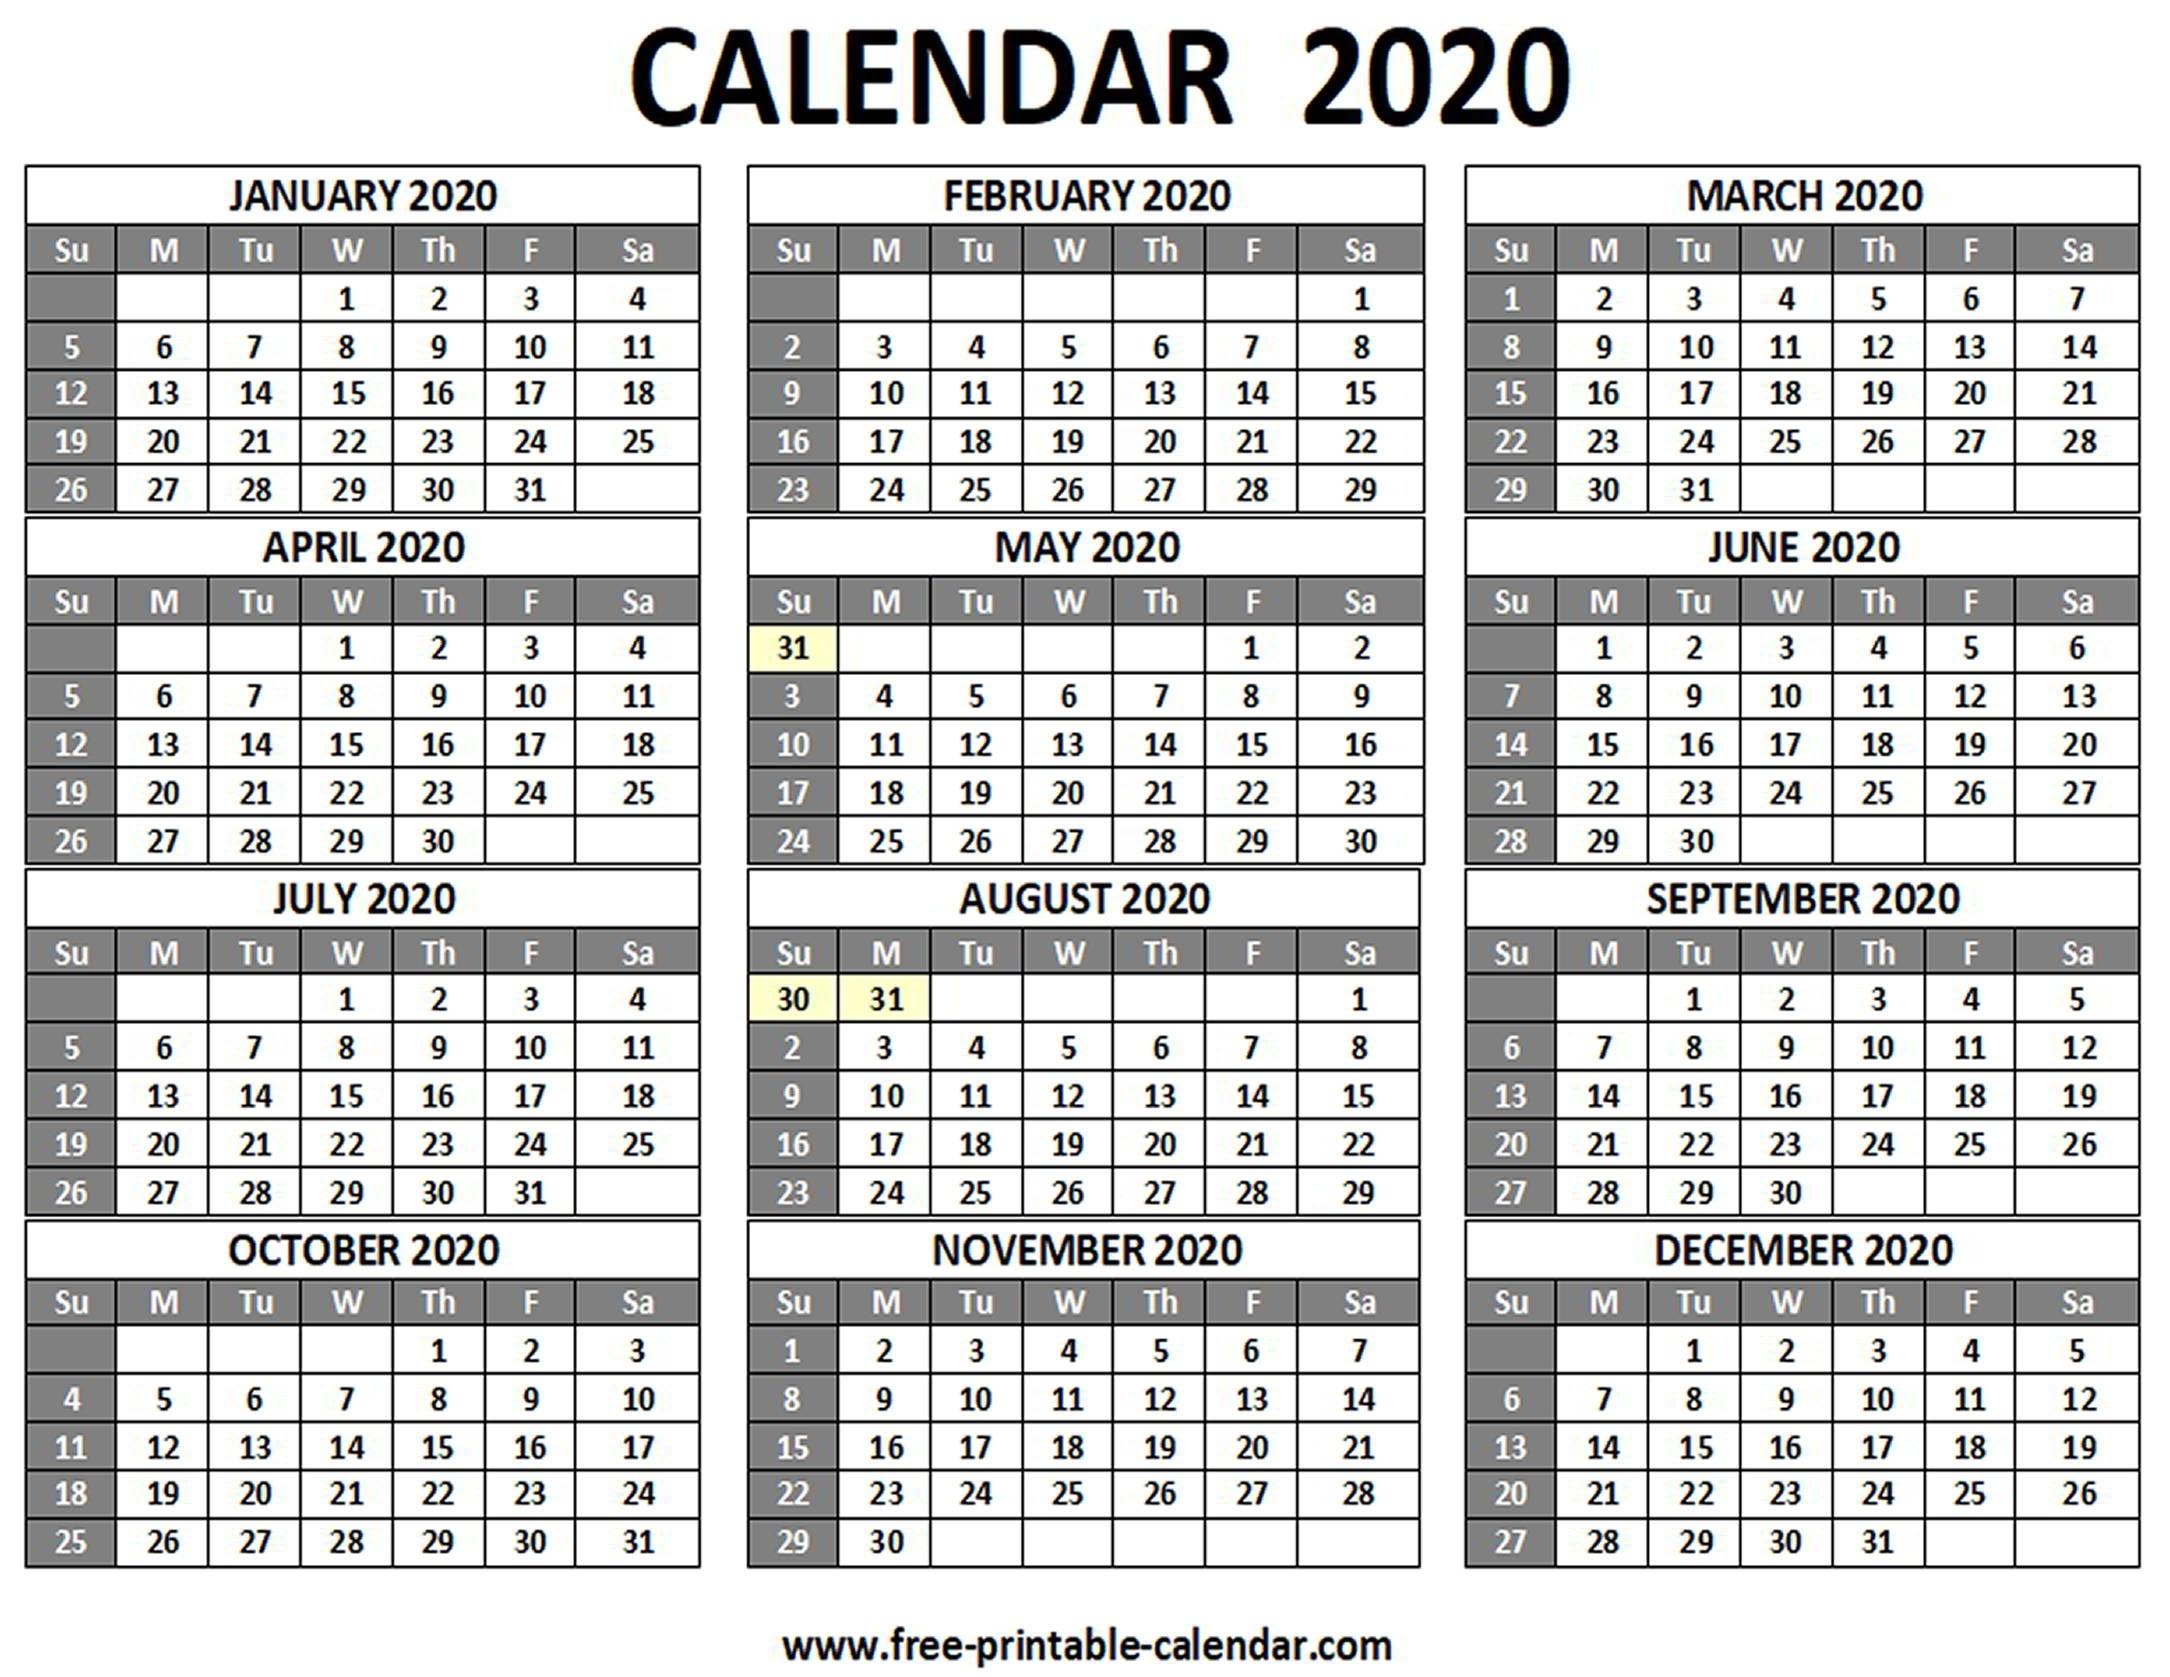 Free Printable 2020 Calendar With Holidays Singapore - 15+ December_Blank Calendar 2020-19 Pdf